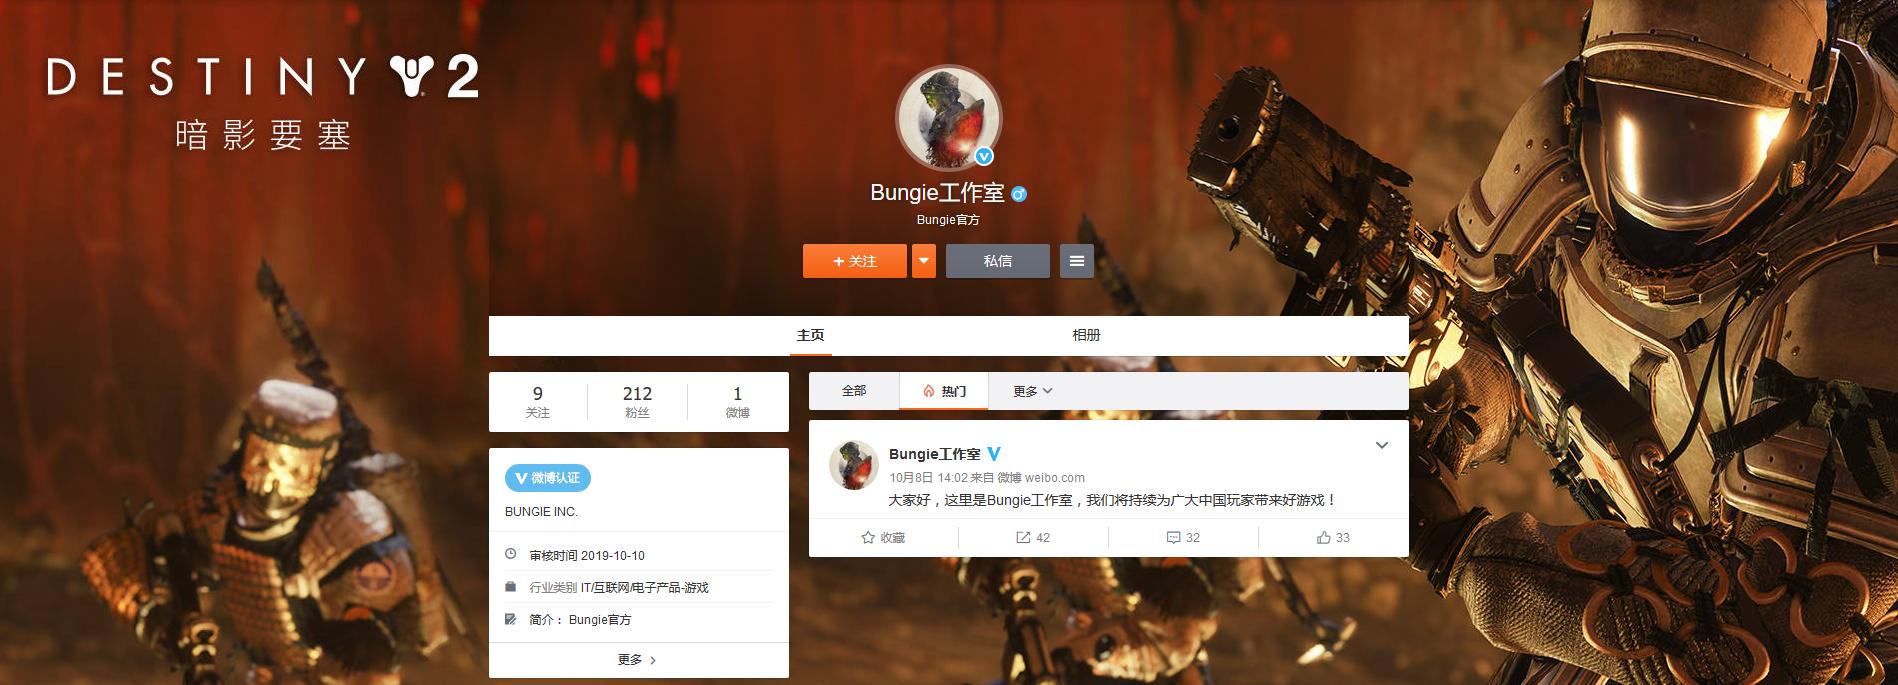 Bungie开通中国官博:将为中国玩家带来好游戏